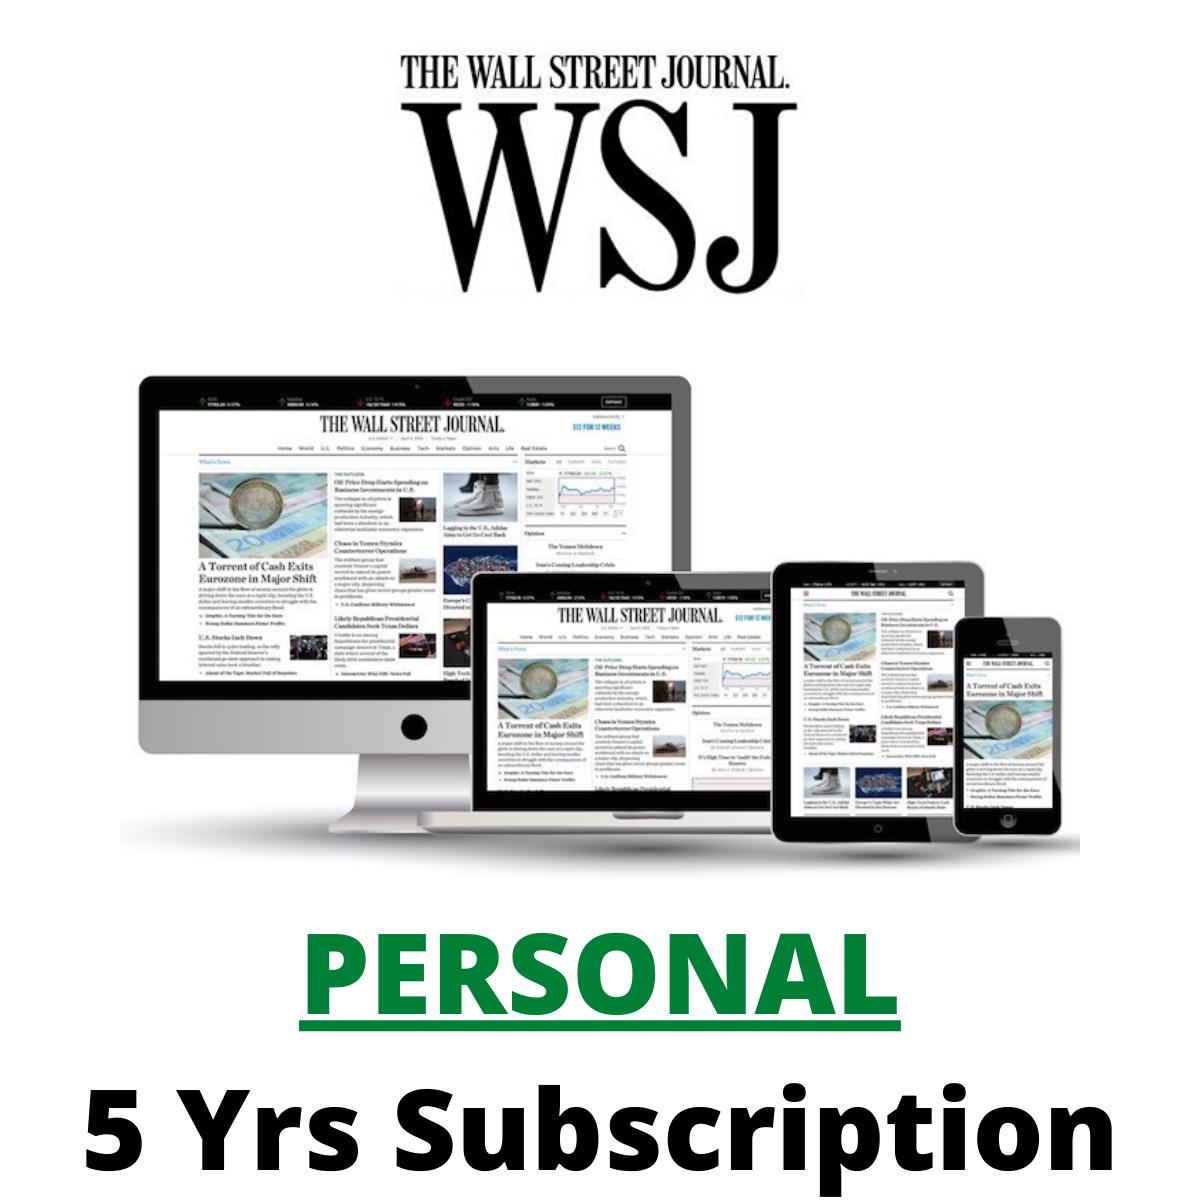 Wall street journal wsj assinatura digital de 5 anos ios/android/pc irrestrito